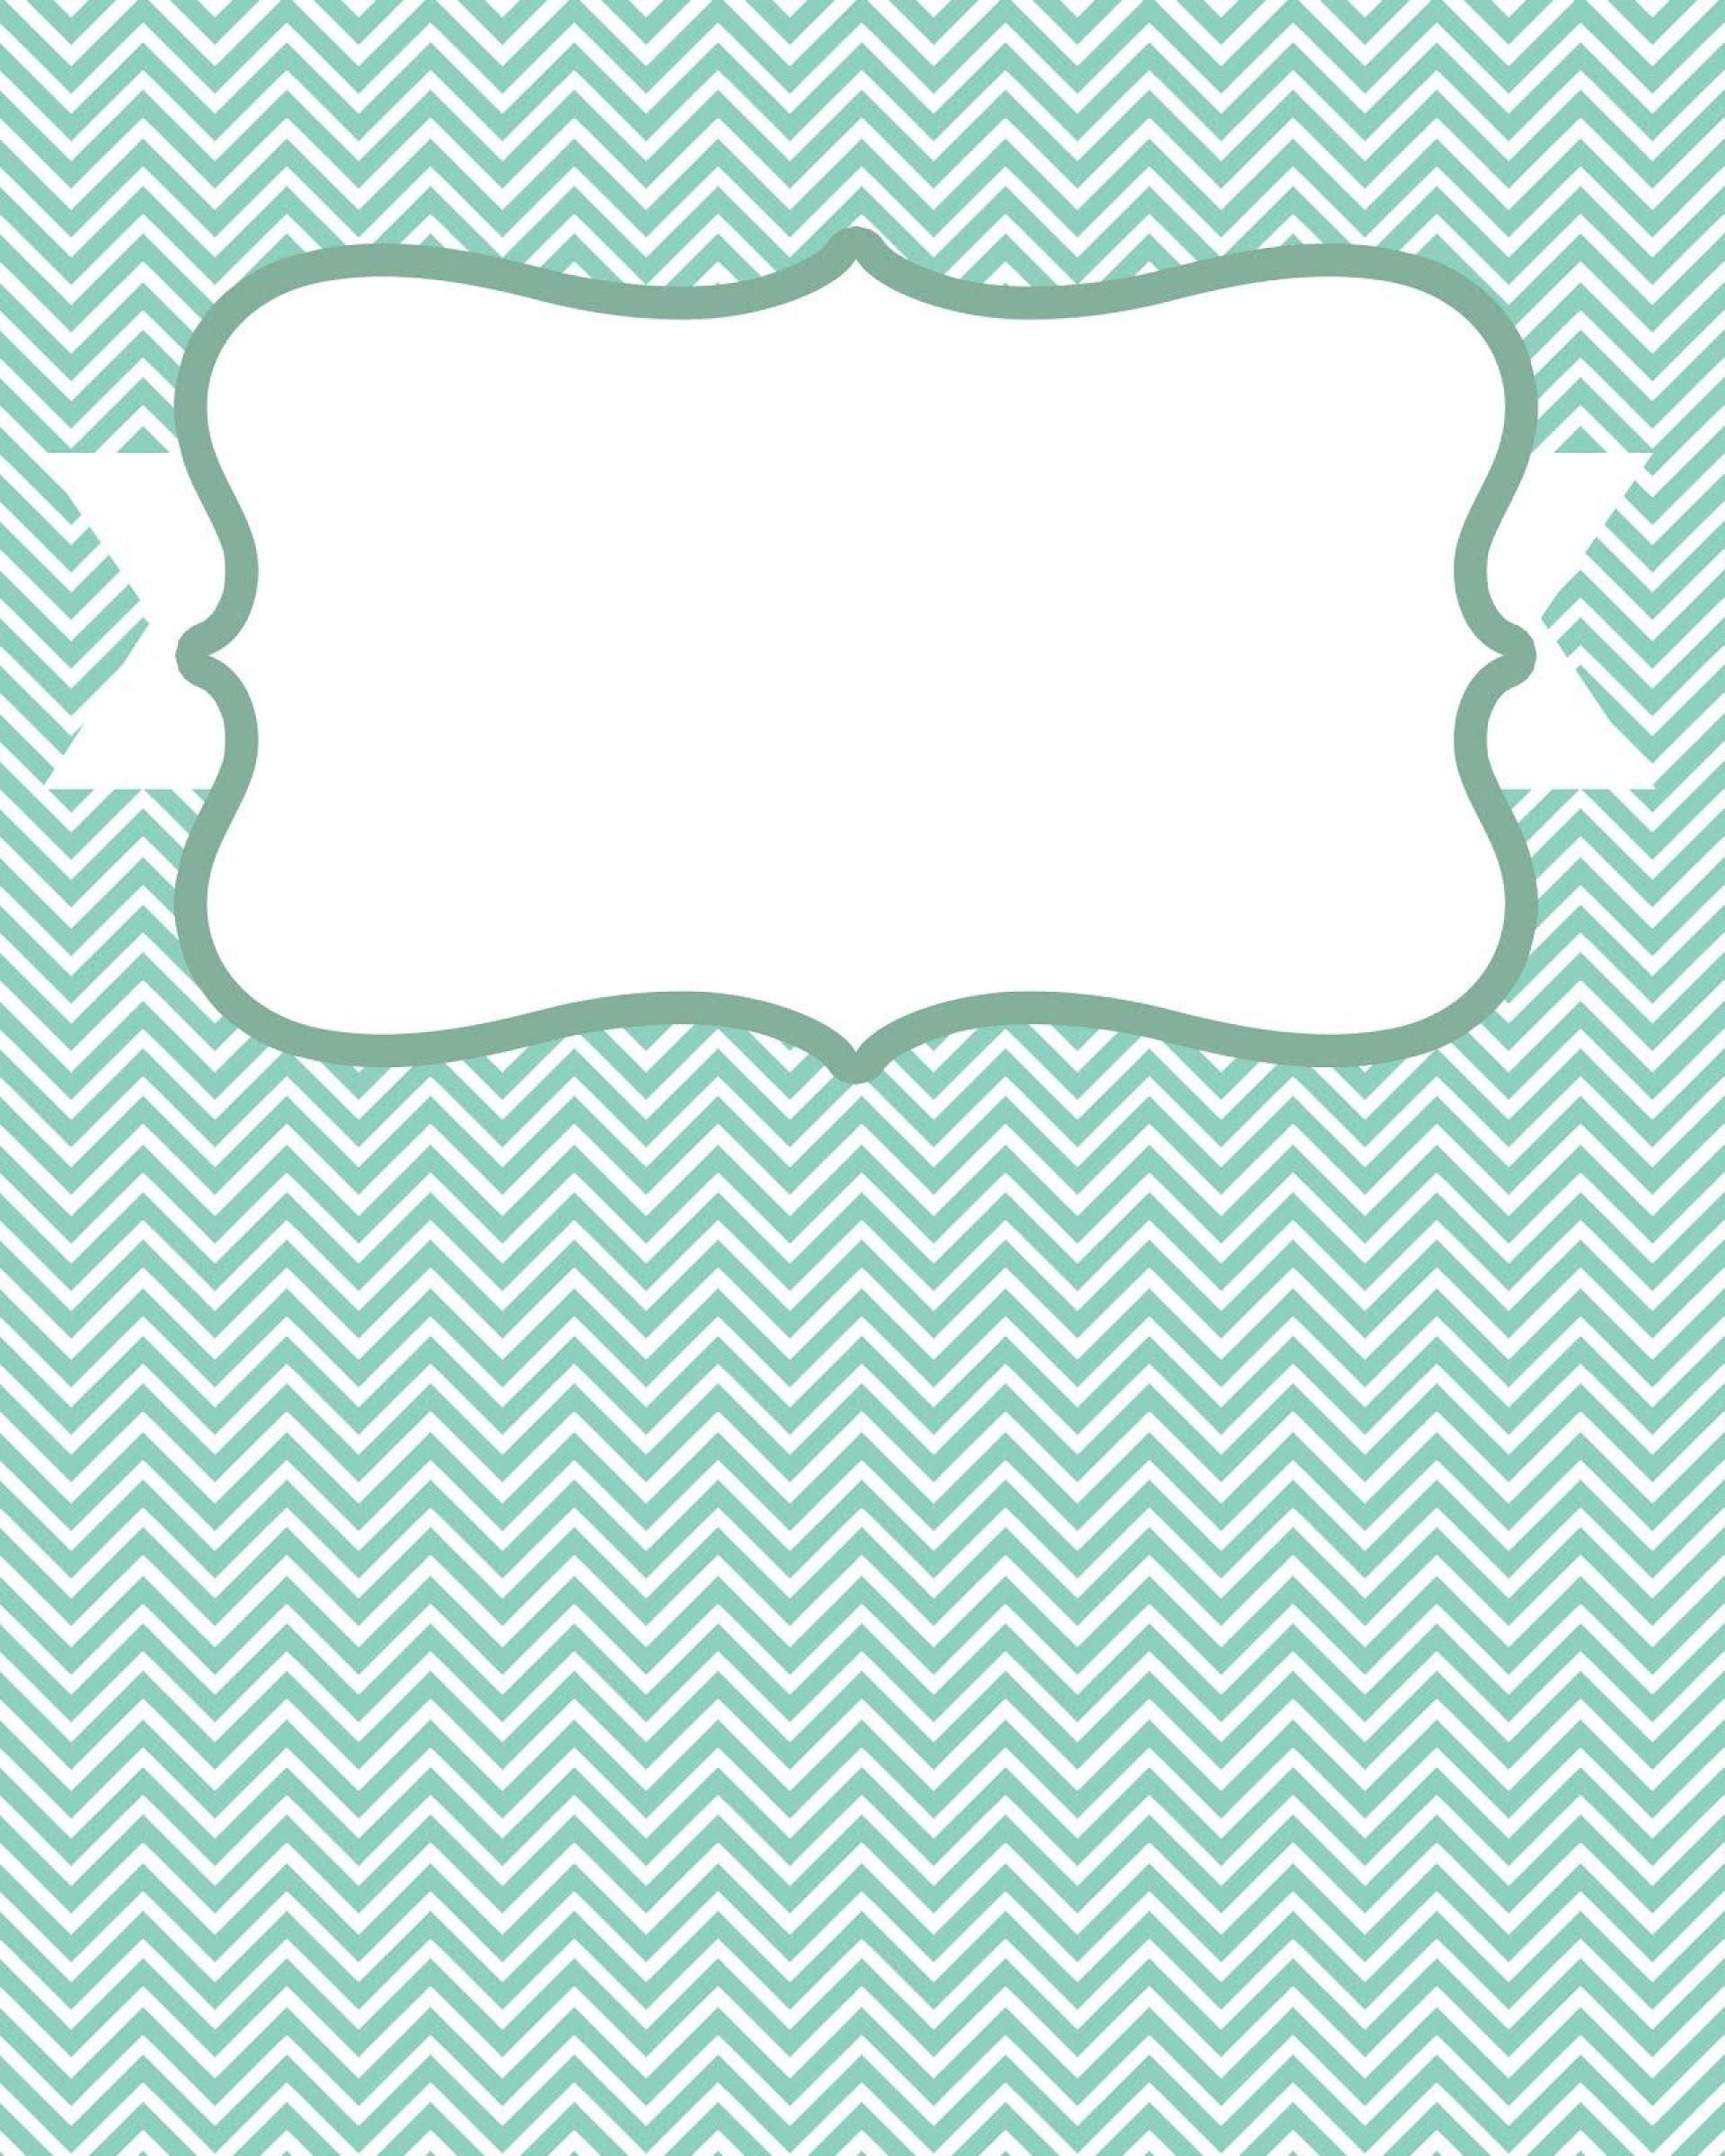 027 Free Printable Customizable Binder Covers Best Of - Free Printable Binder Cover Templates